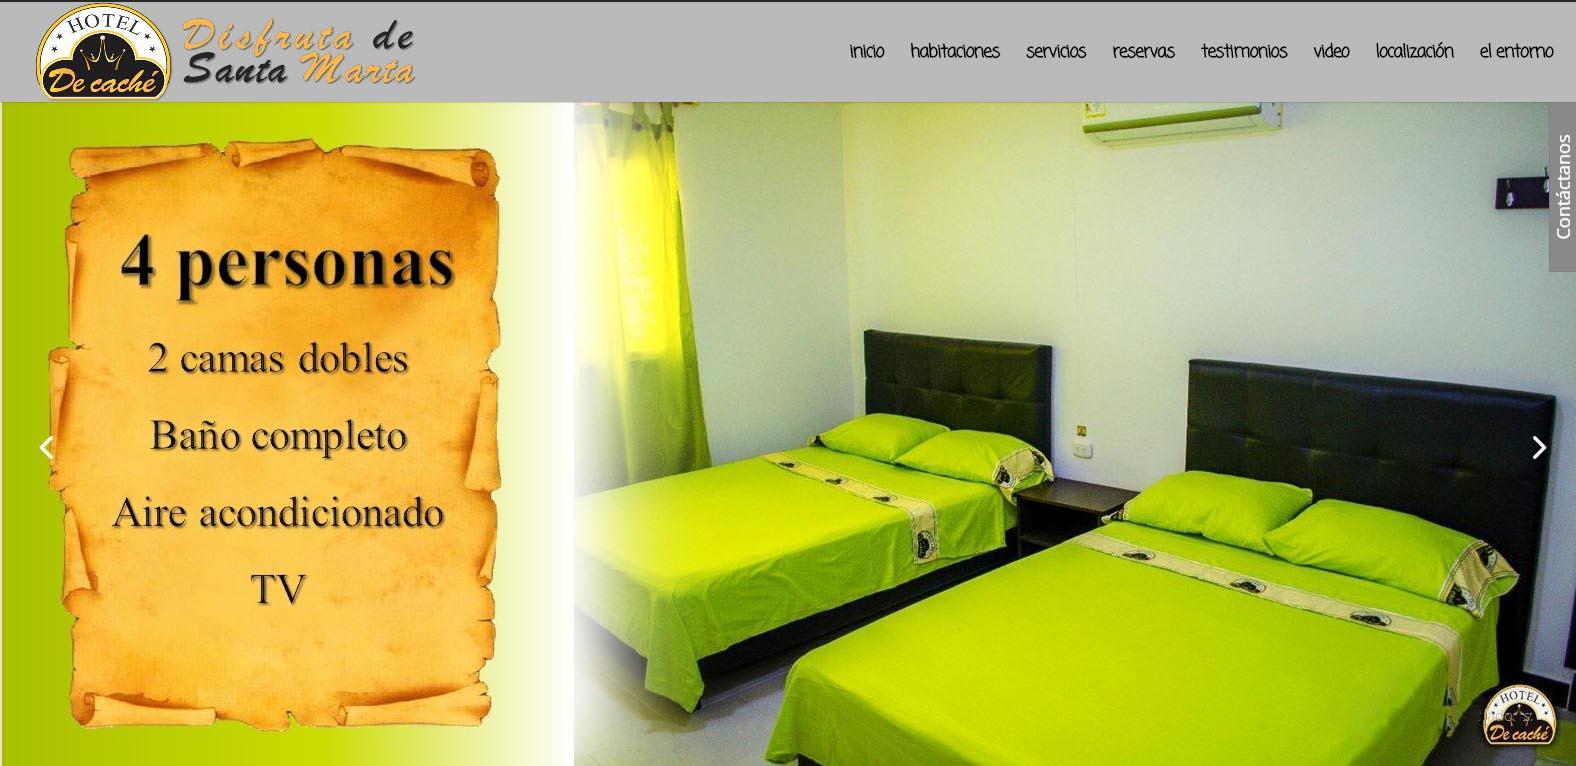 servicios_diseno_responsive_hotel_de_cache_pc_web_papillon_1576x766_k6